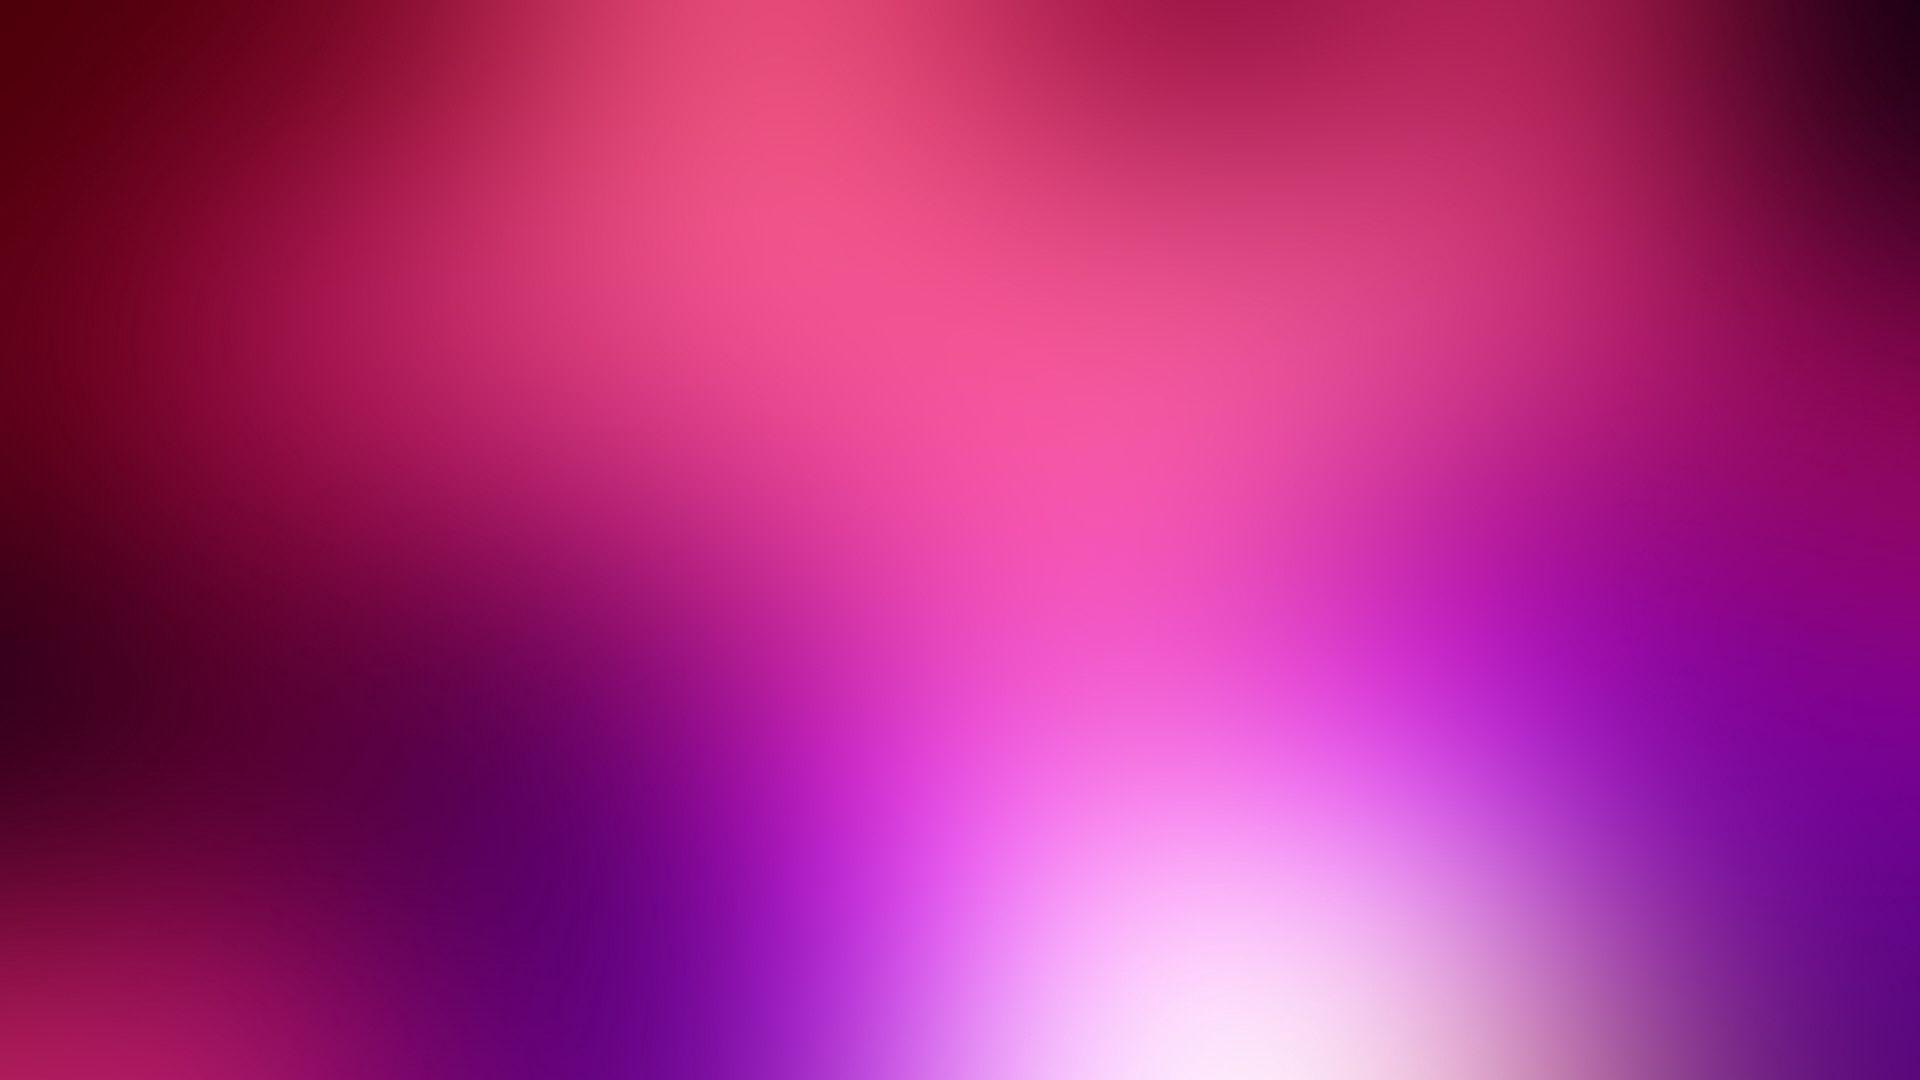 Purple And White Wallpaper Image